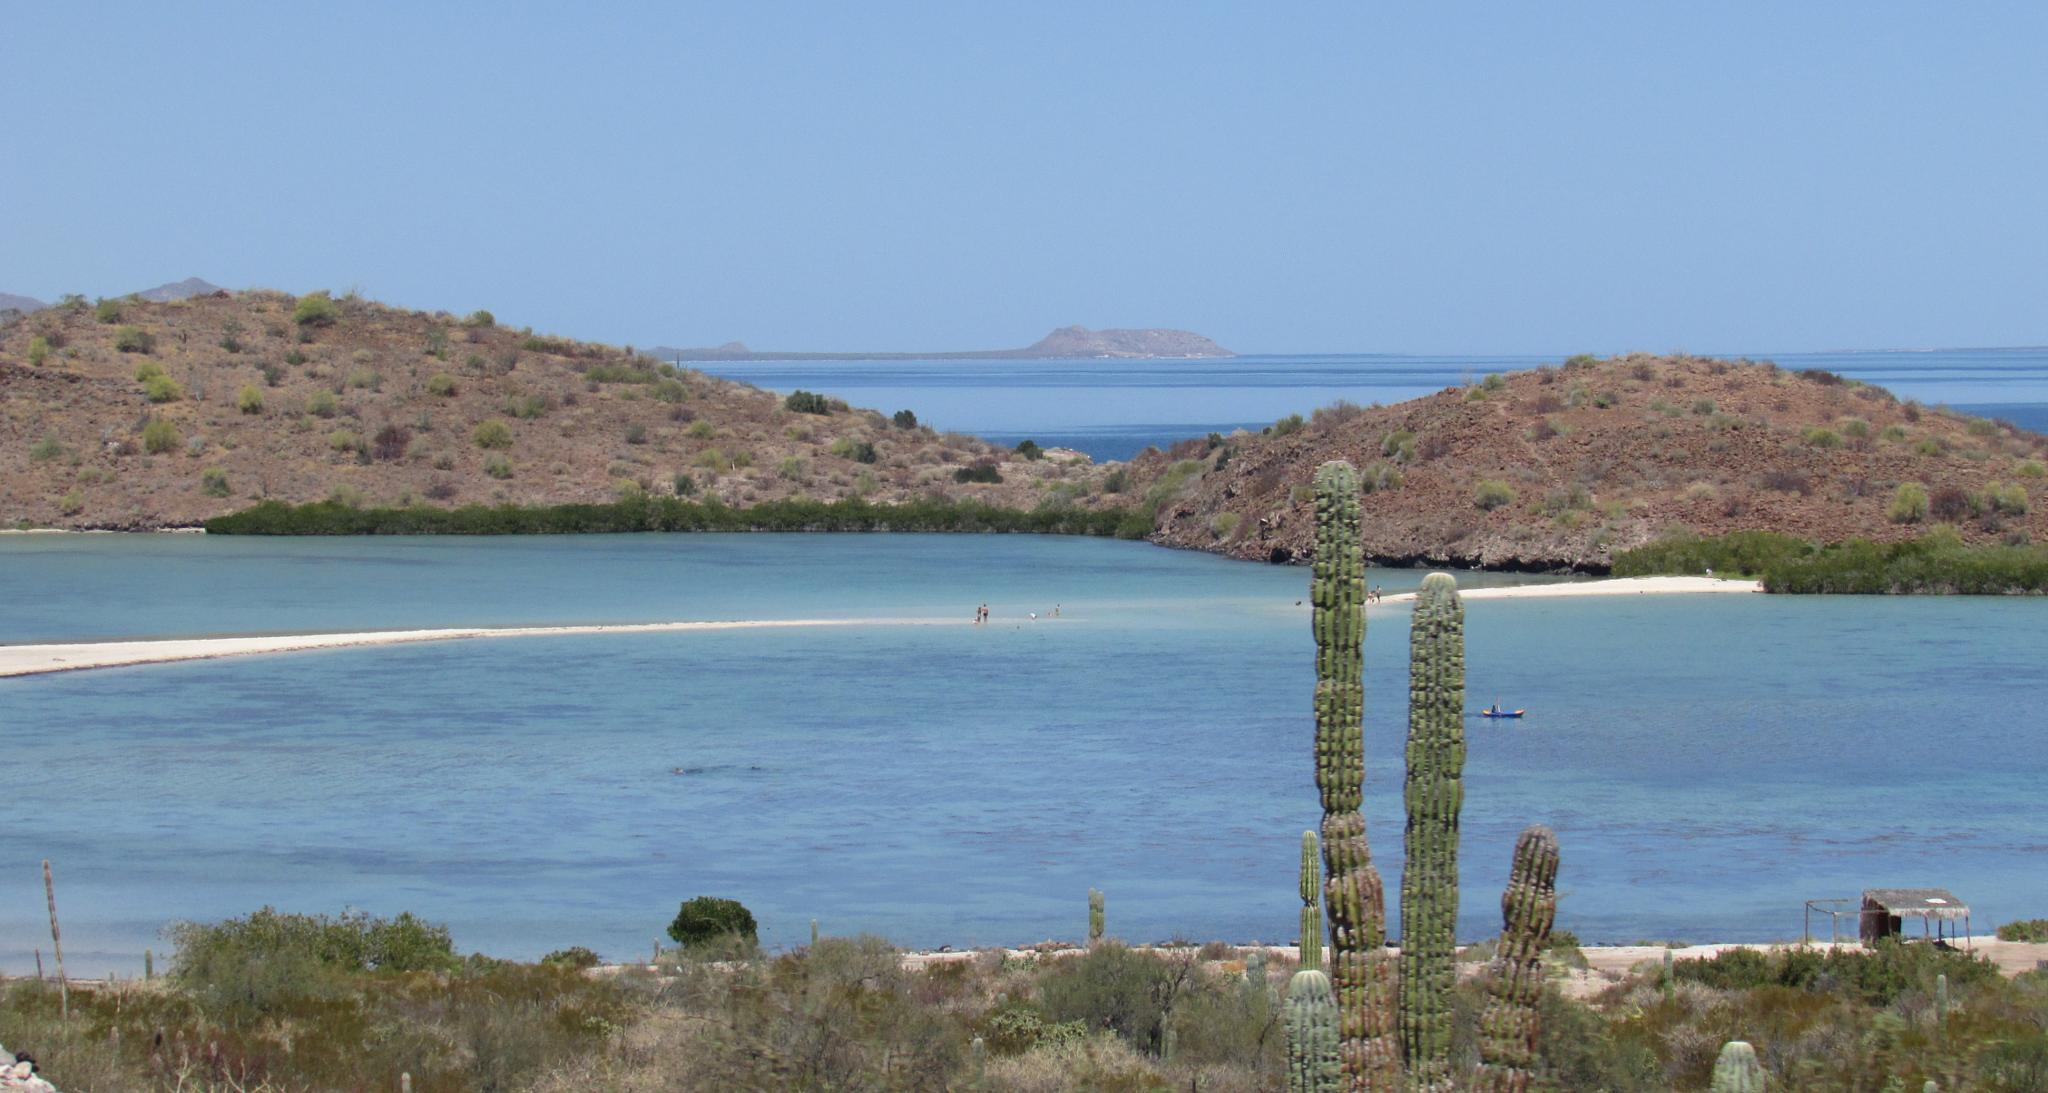 Cactus to the Sea, near Mulege,  Baja California Sur, Mexico by Lisa Marshall Moore